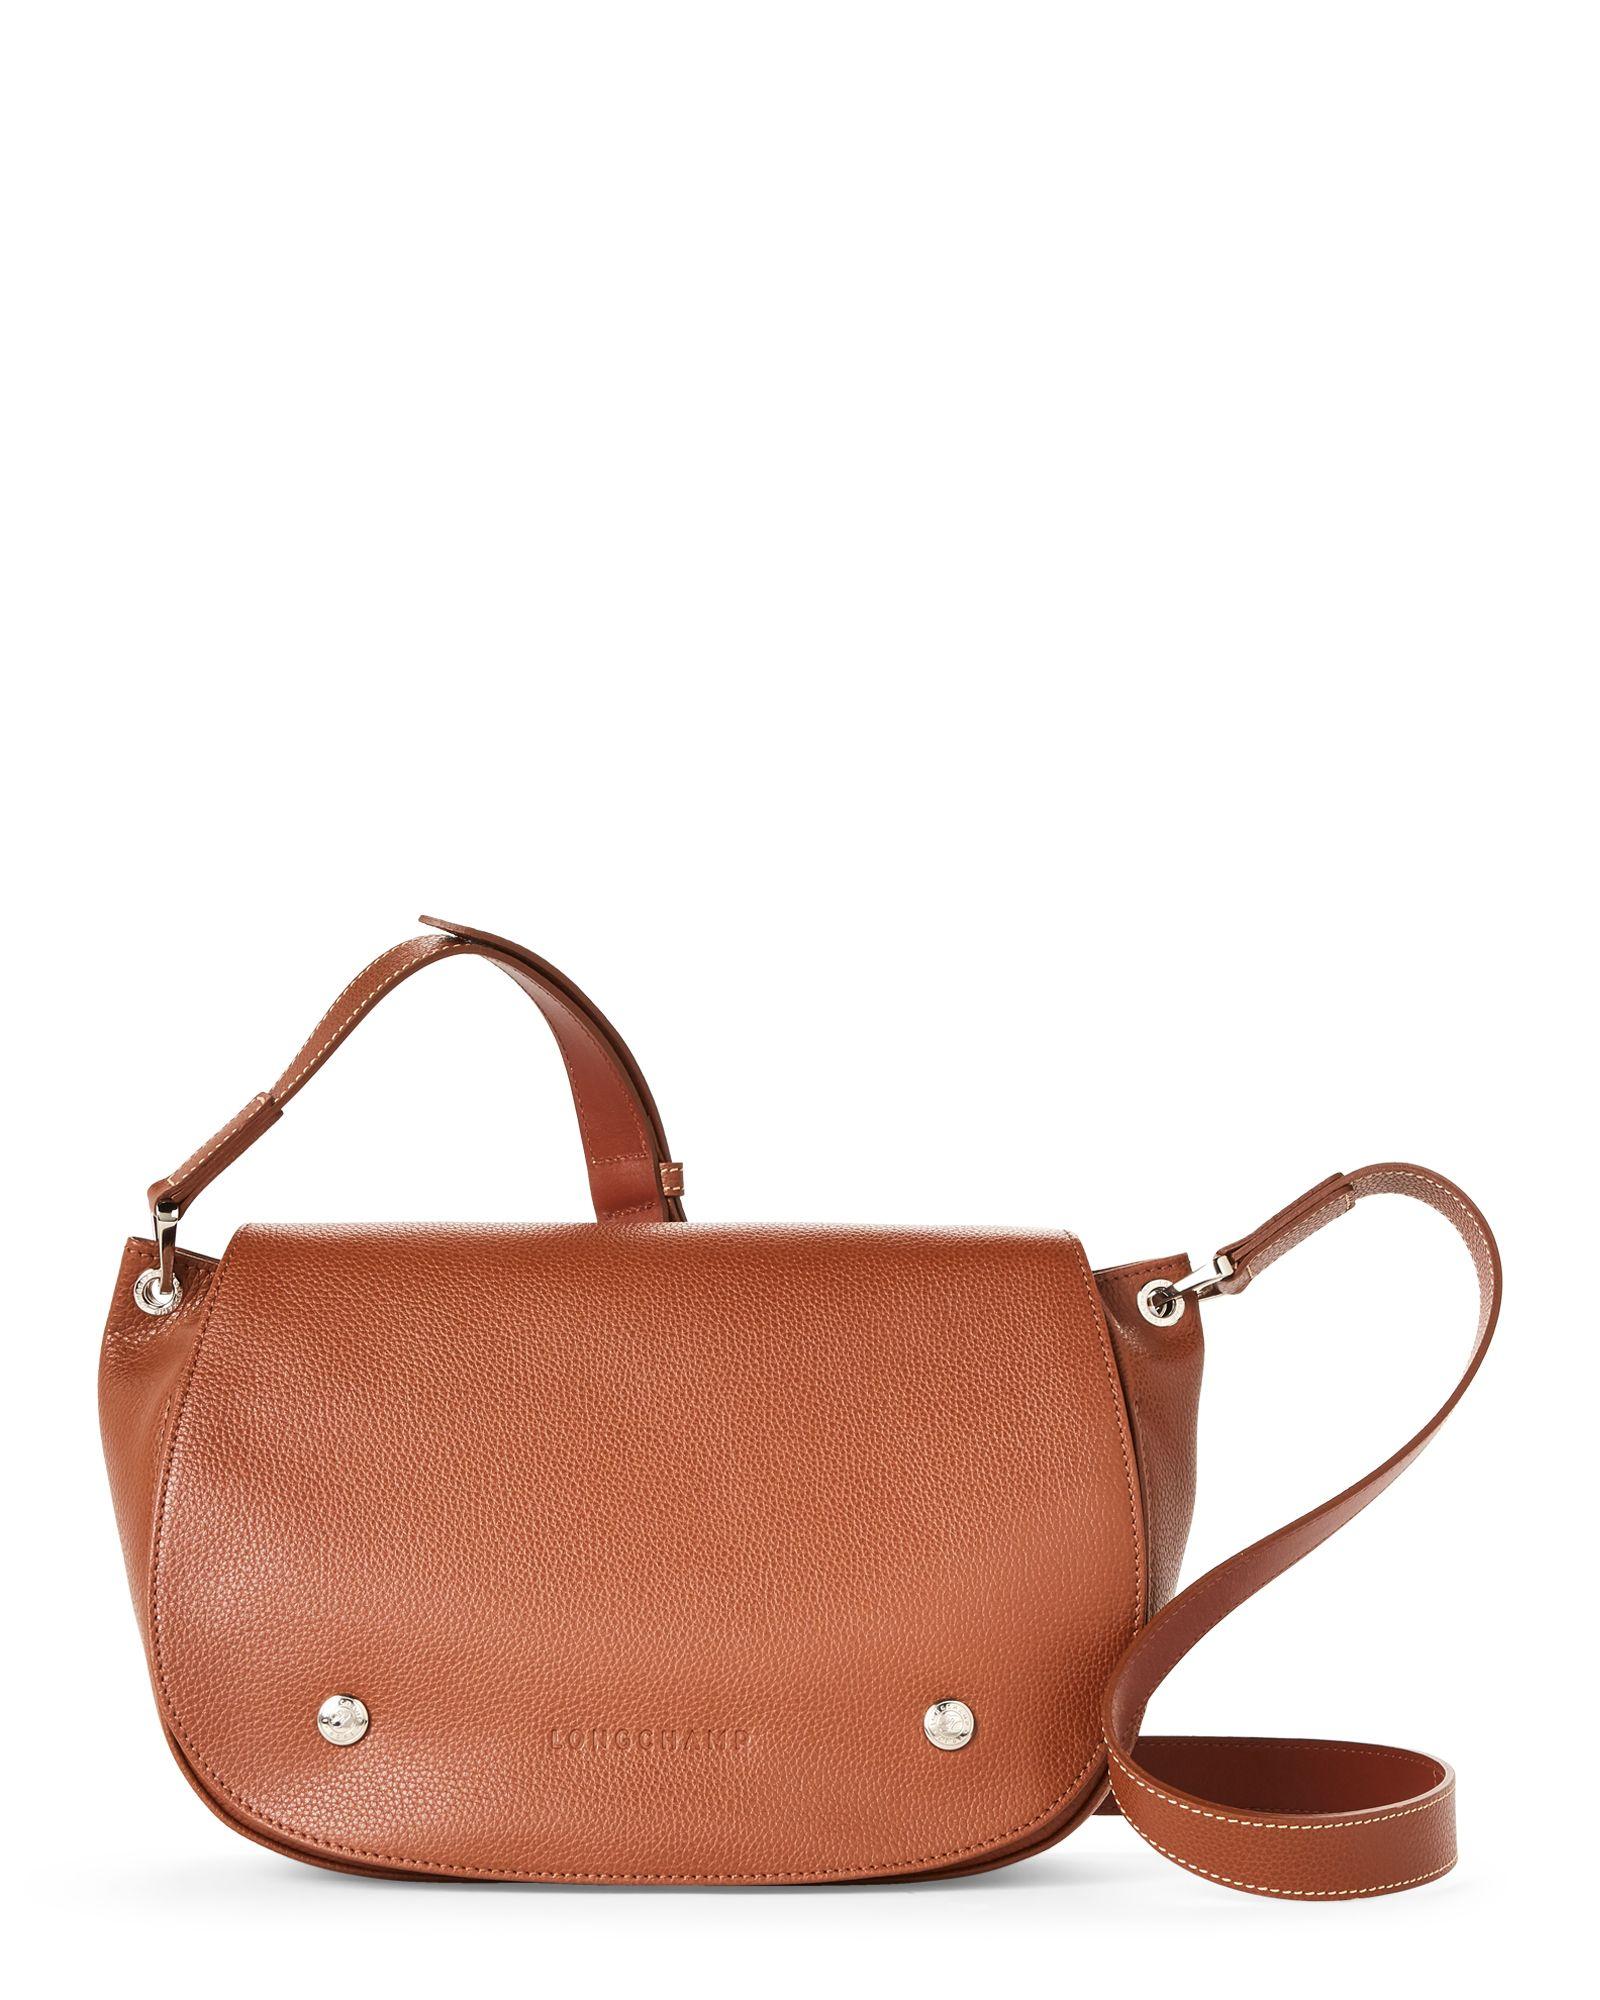 Longchamp Cognac Le Foulonne Leather Saddle Bag | Leather saddle ...